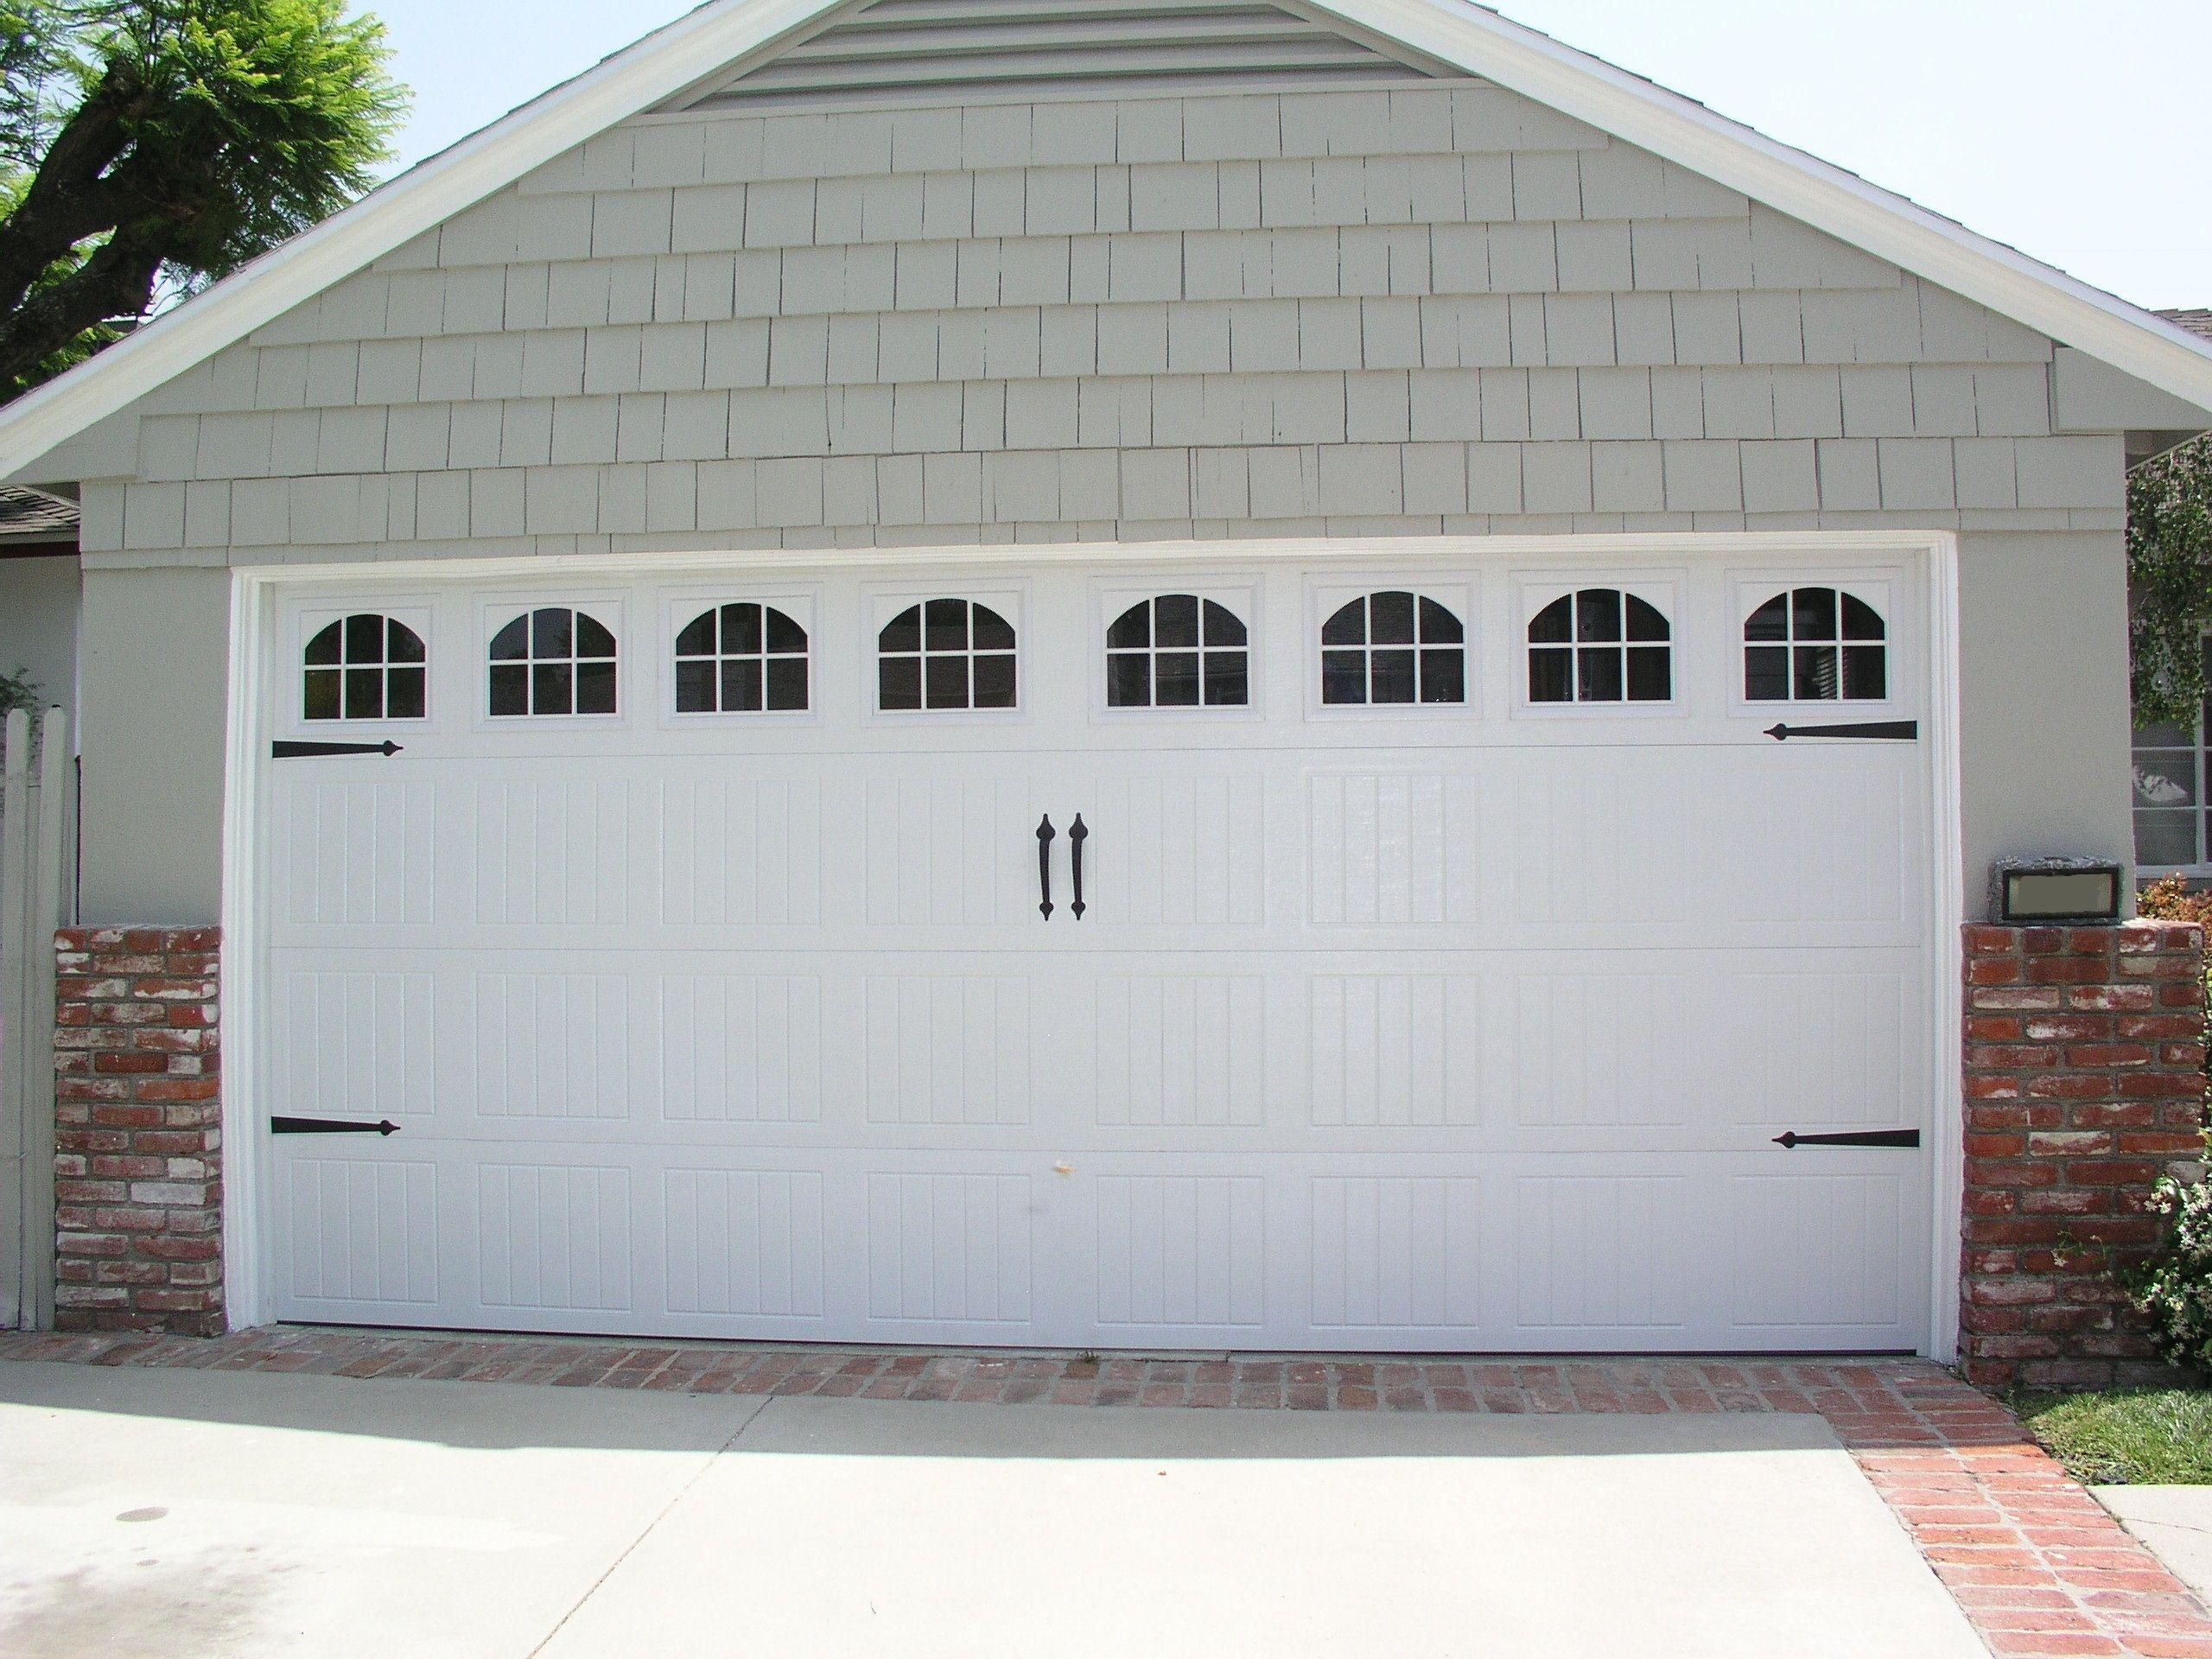 medium resolution of wayne dalton sonoma white cascade with decorative hardware los angeles ca photo credit agi dyer garagedoor garagedoors garages garage door